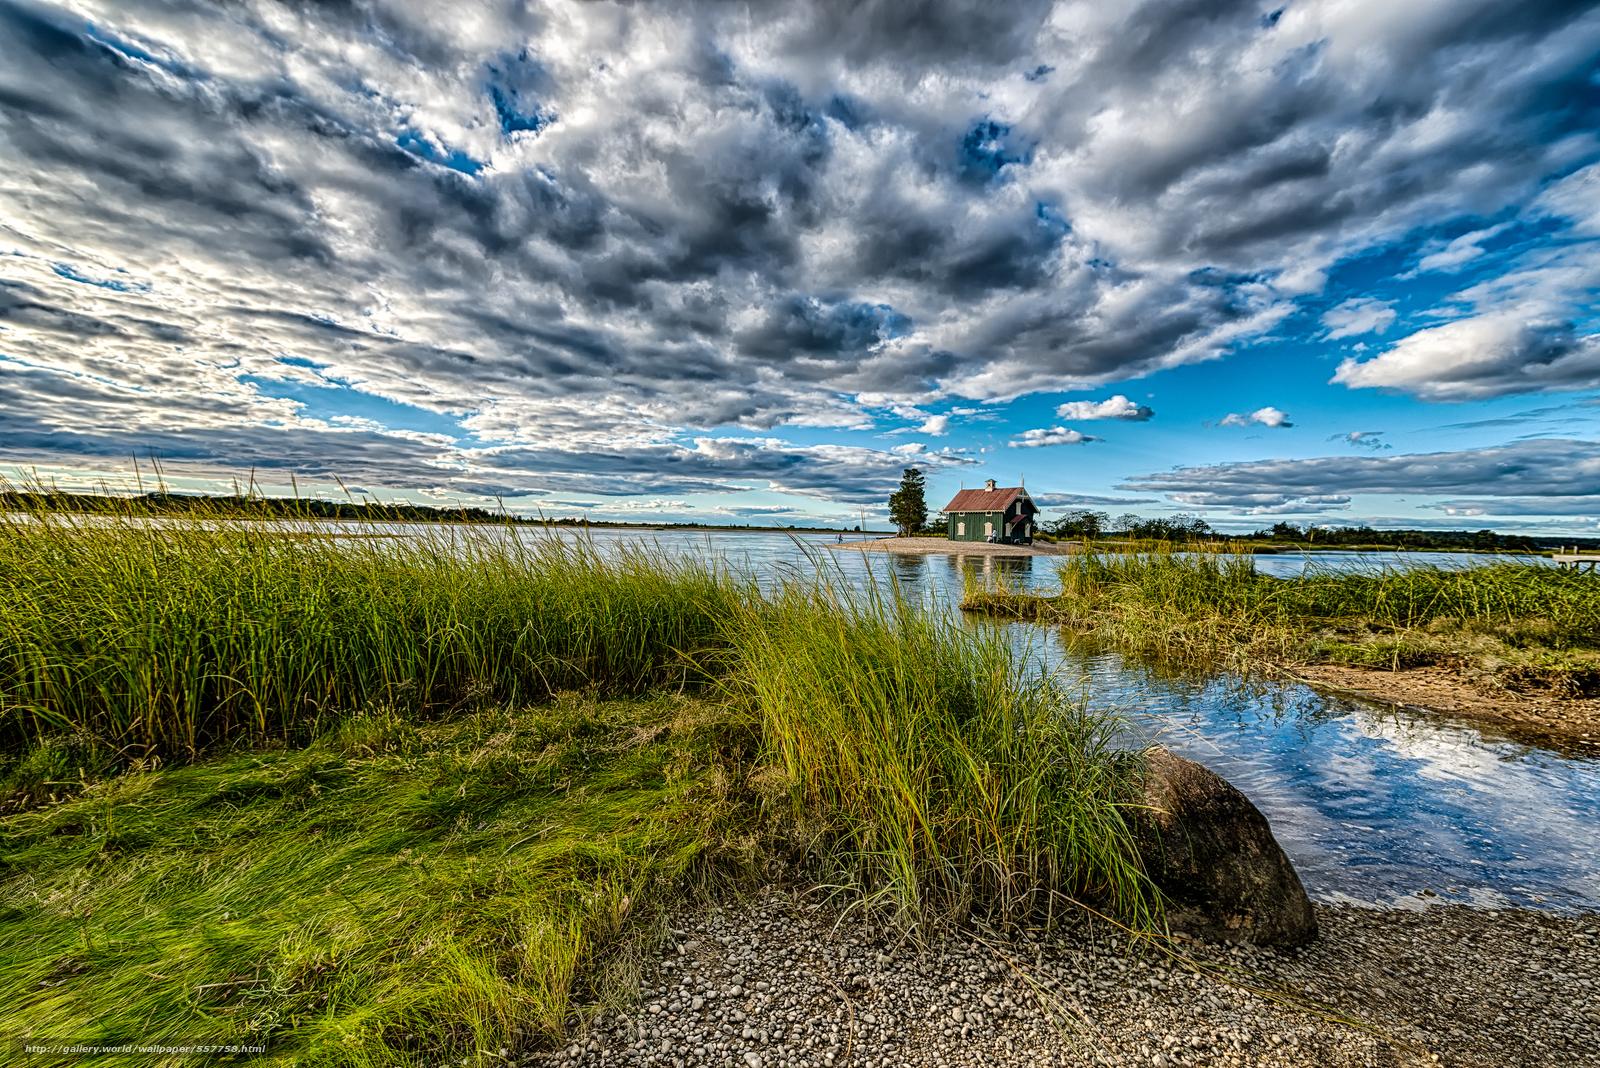 Download Hintergrund Stony Brook Harbor   Long Island New York 1600x1068